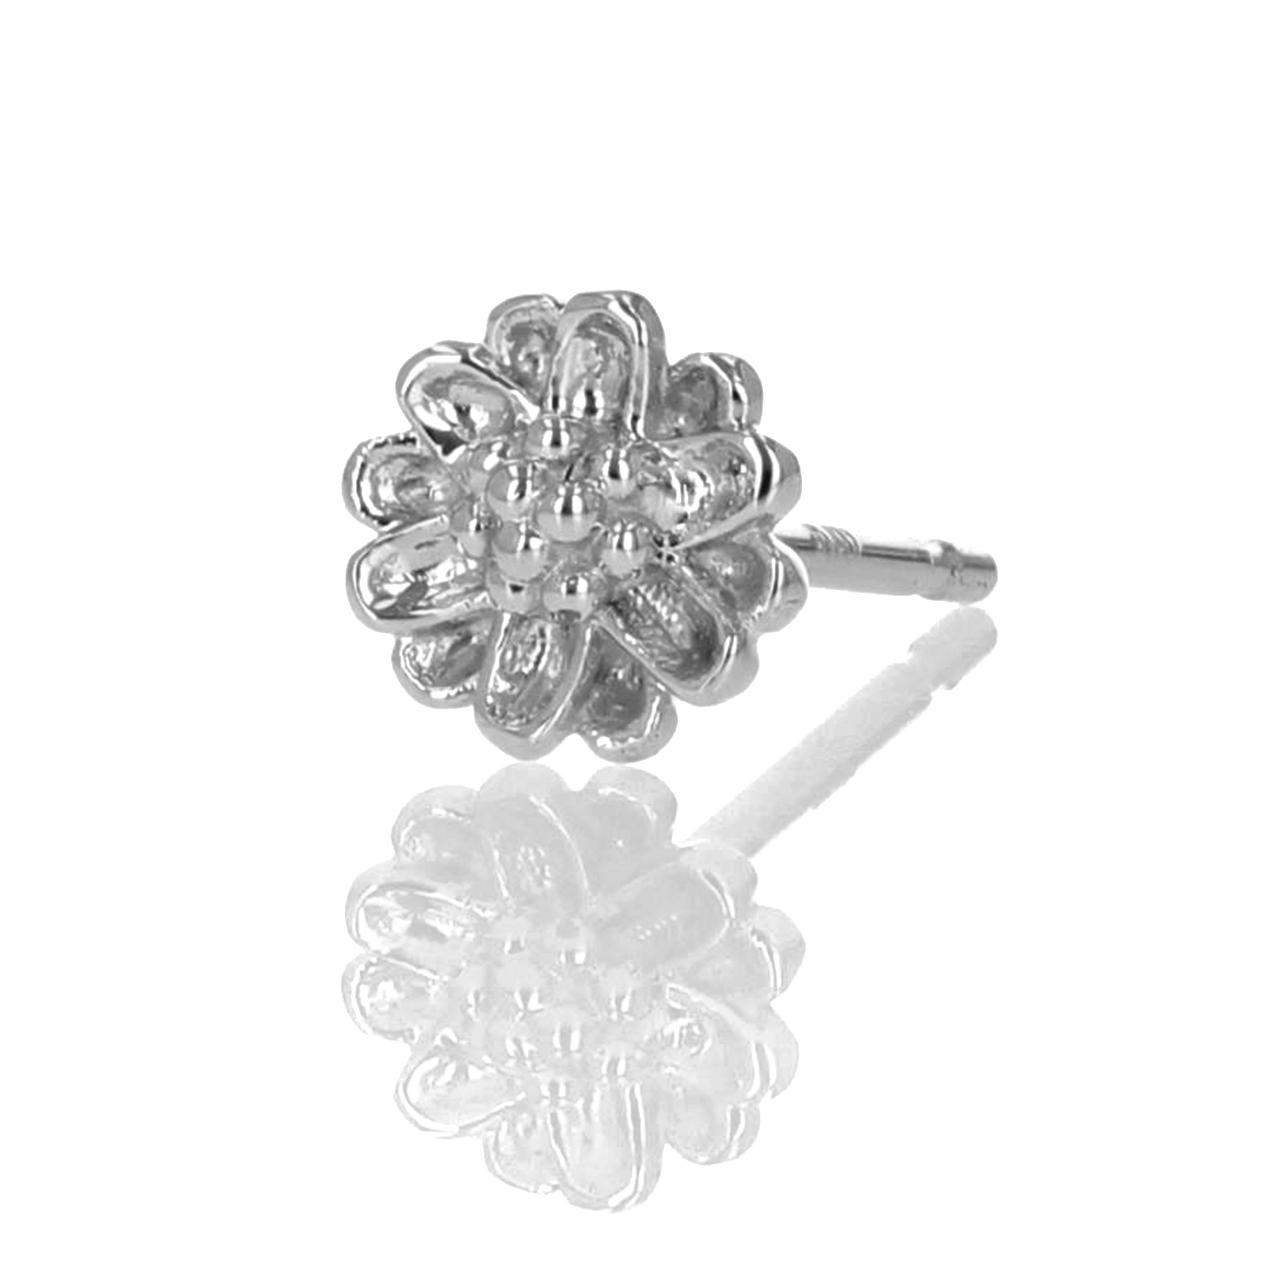 Silver / ピアス (片耳) / Daisy  pierce